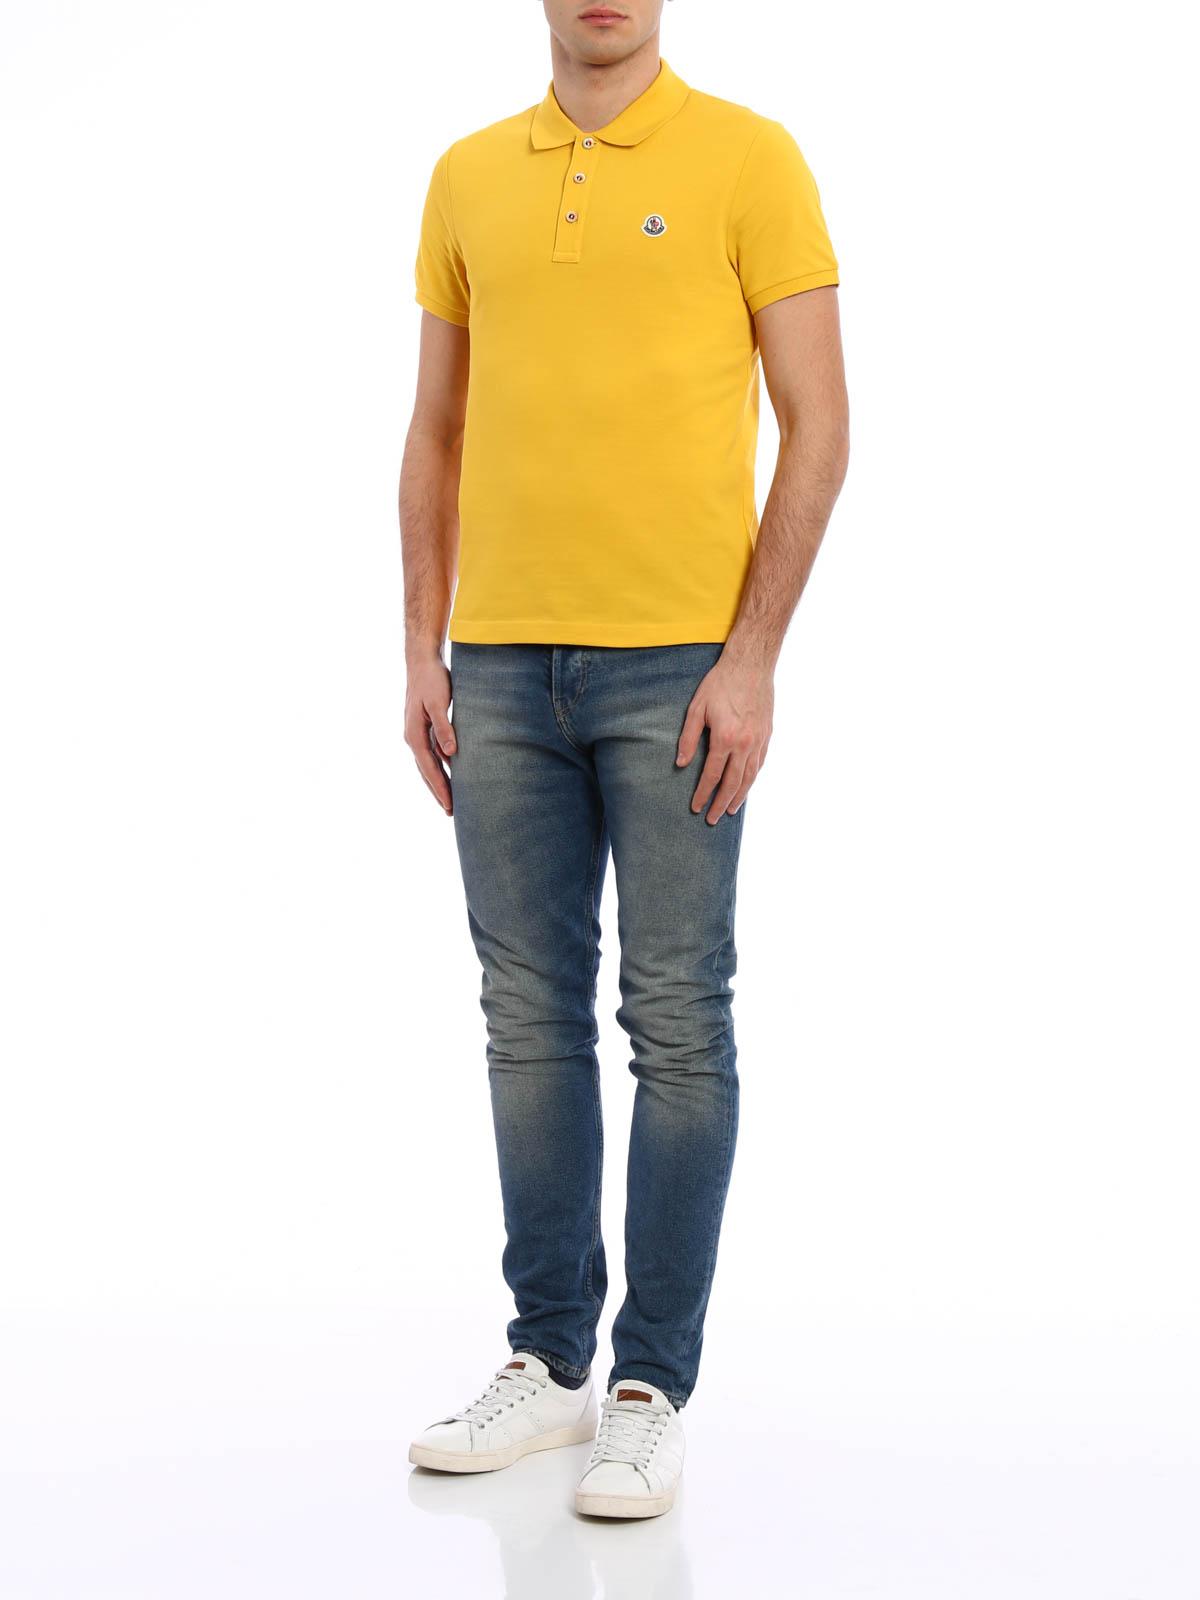 moncler yellow polo shirt